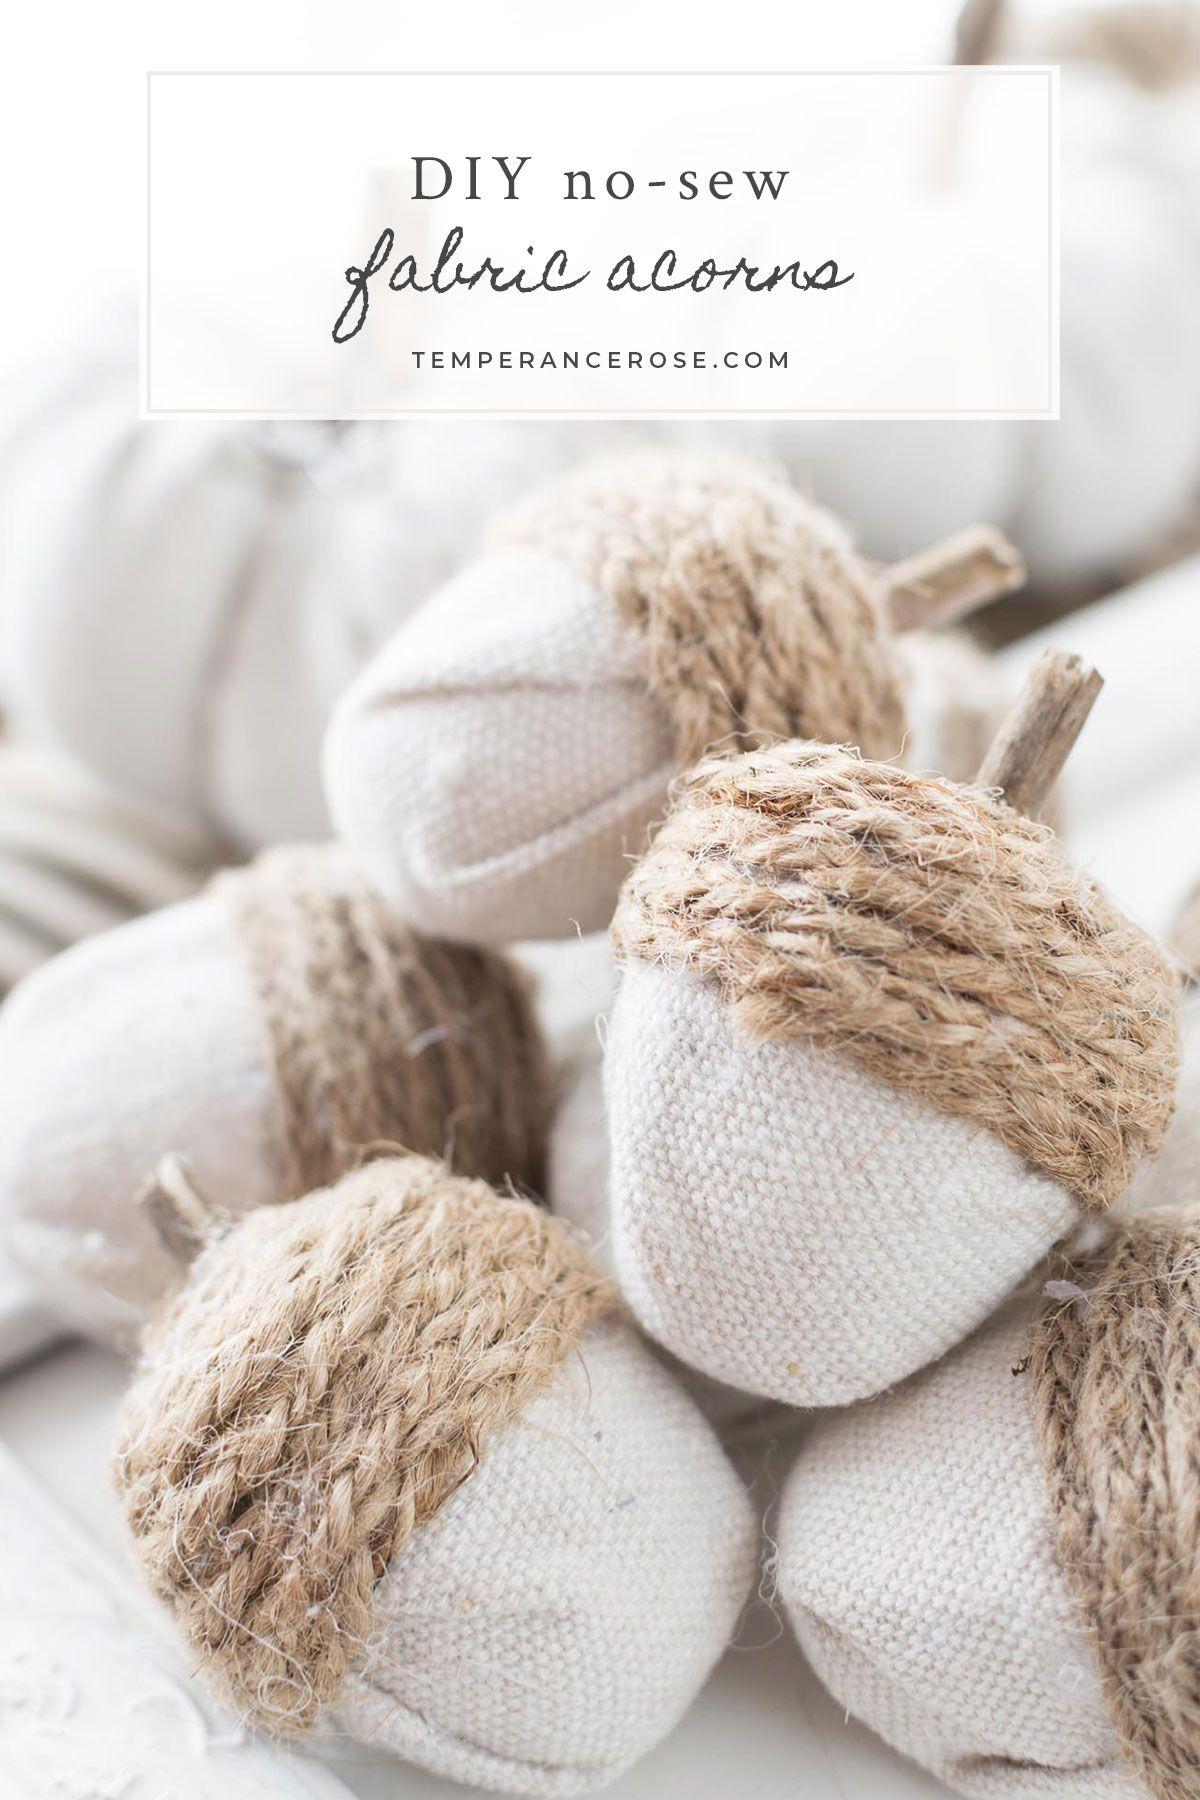 DIY no-sew acorns for fall decorating